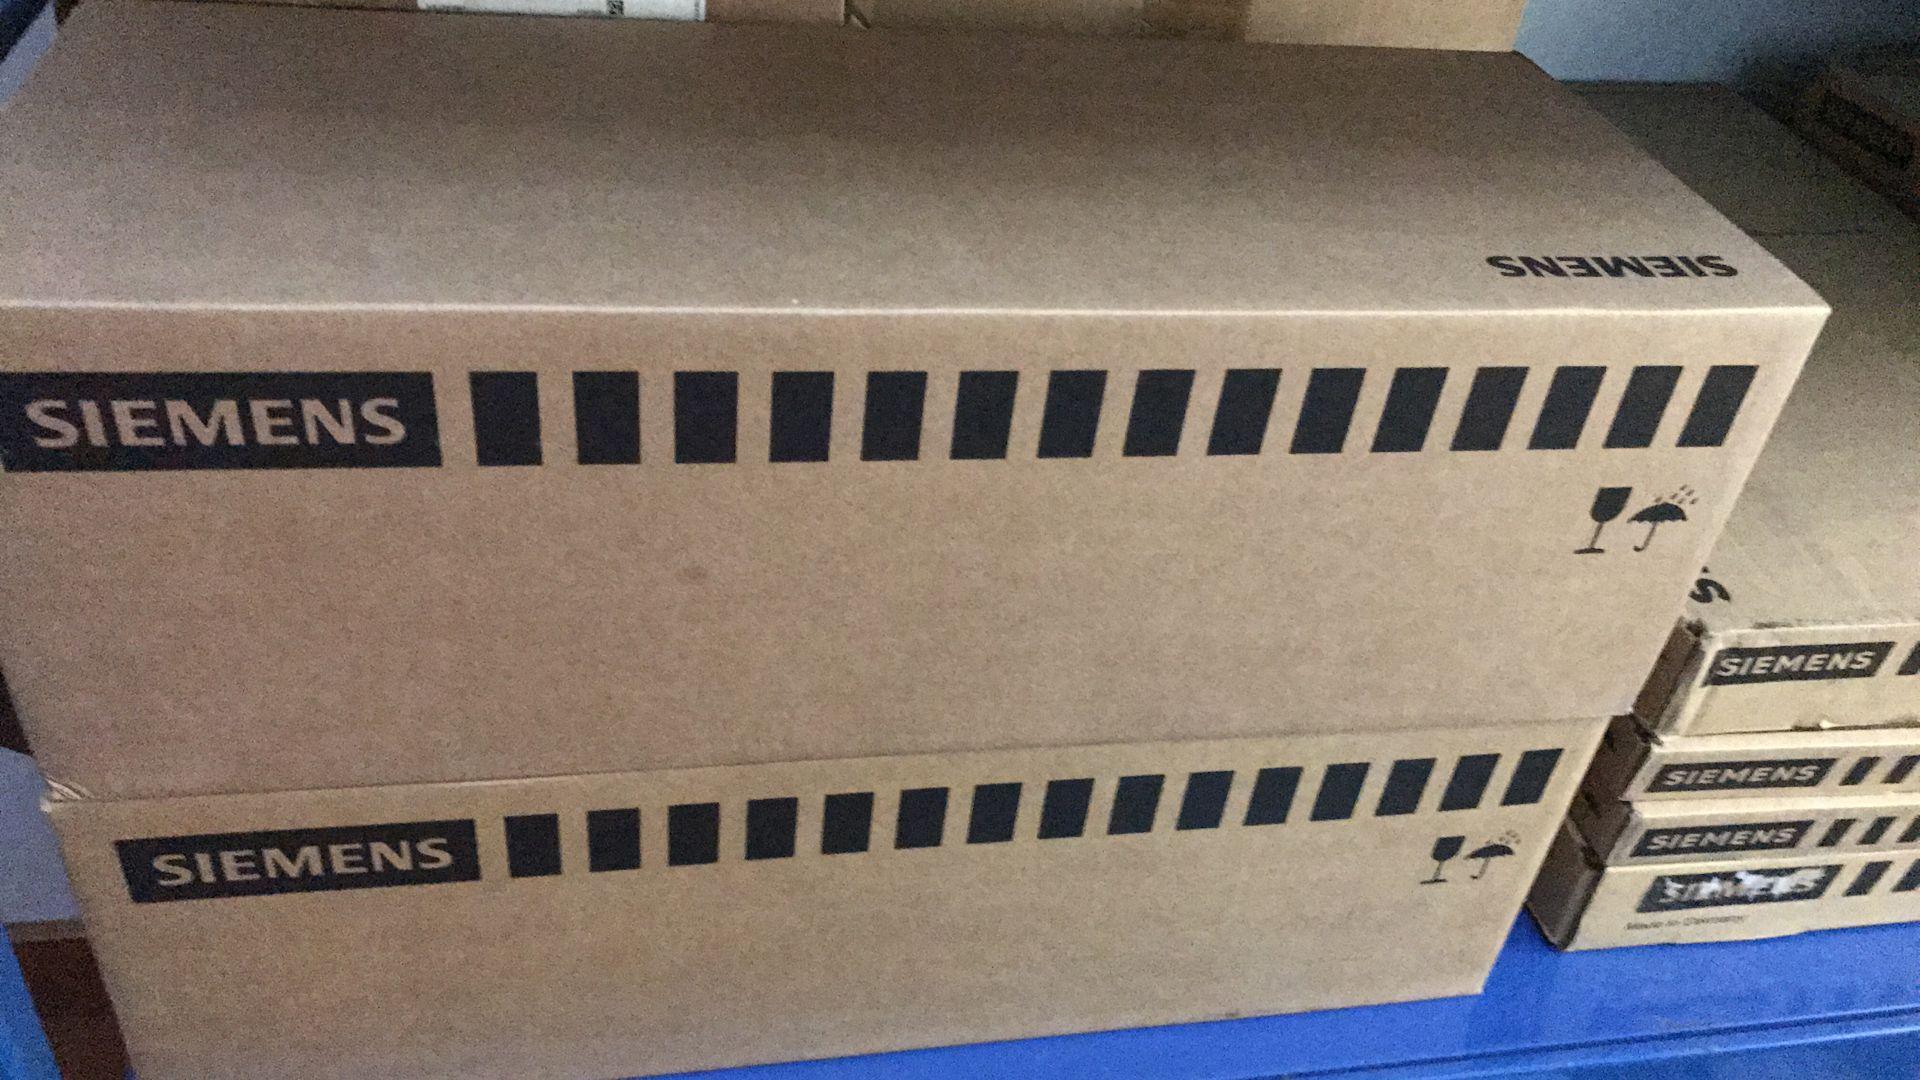 6SL3040-0LA00-0AA1原装正品未拆封CU310DP控制单元